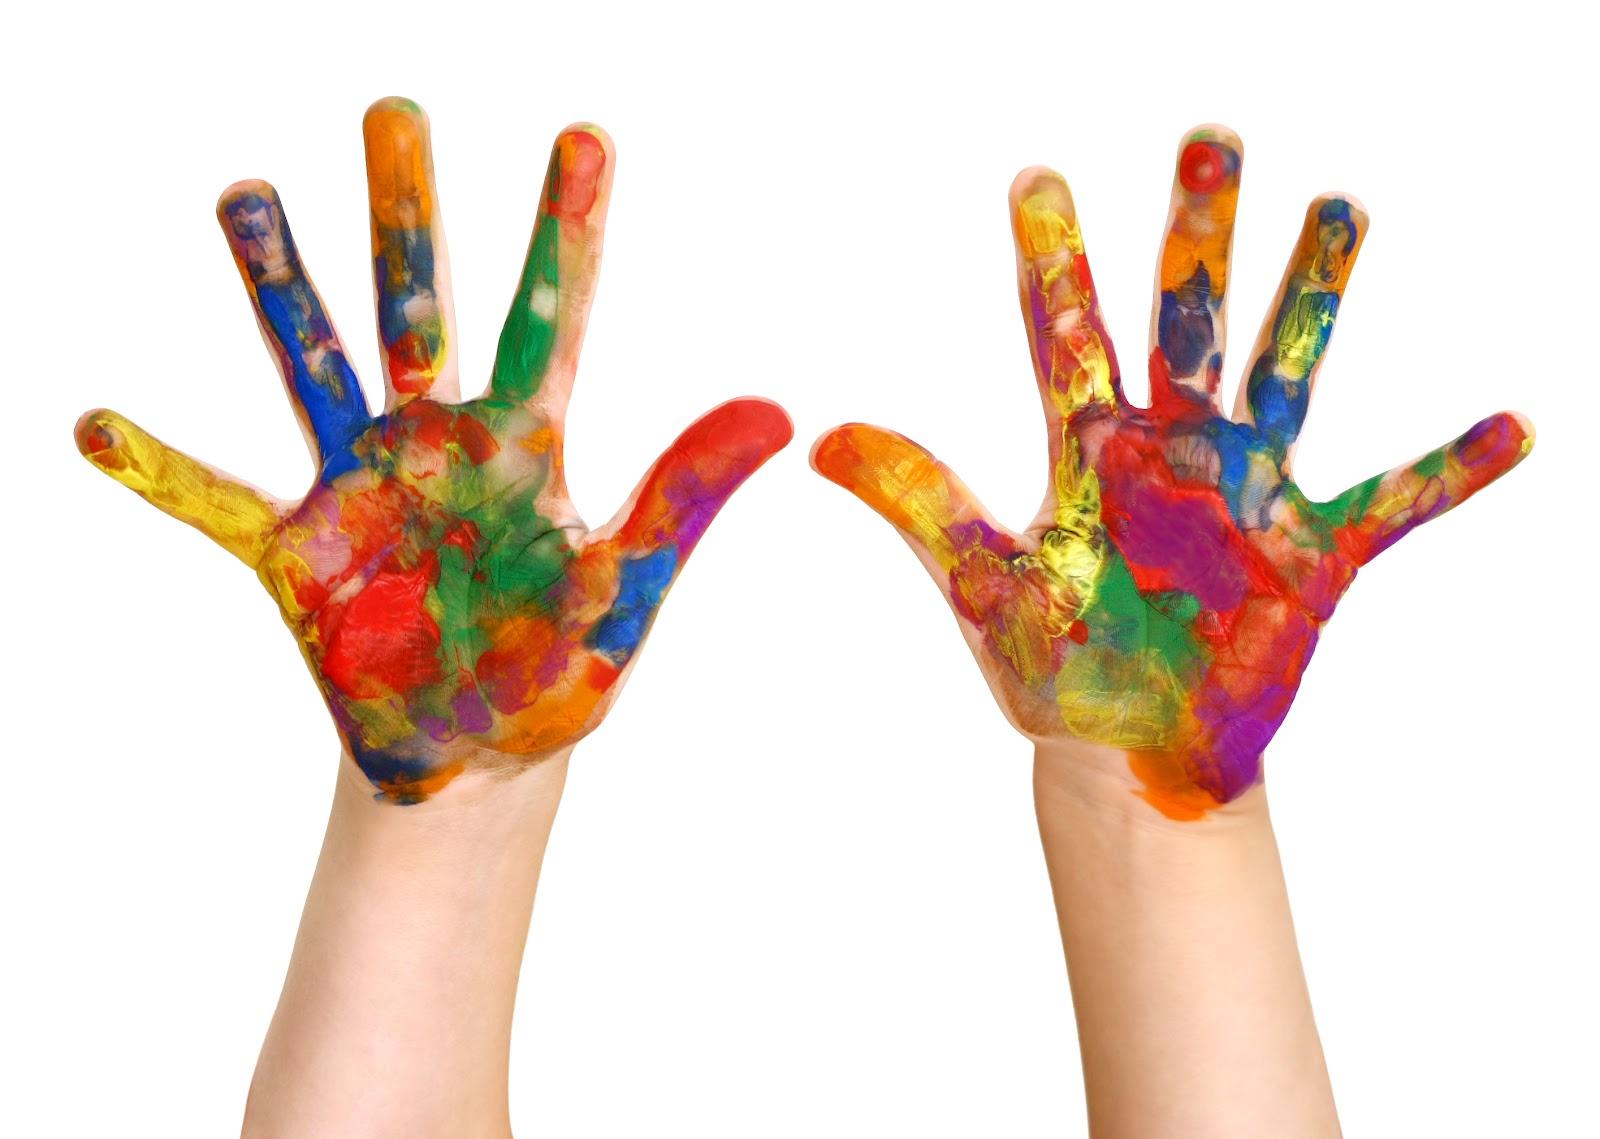 December 4-11, 2015: Ketchikan's Youth in Art